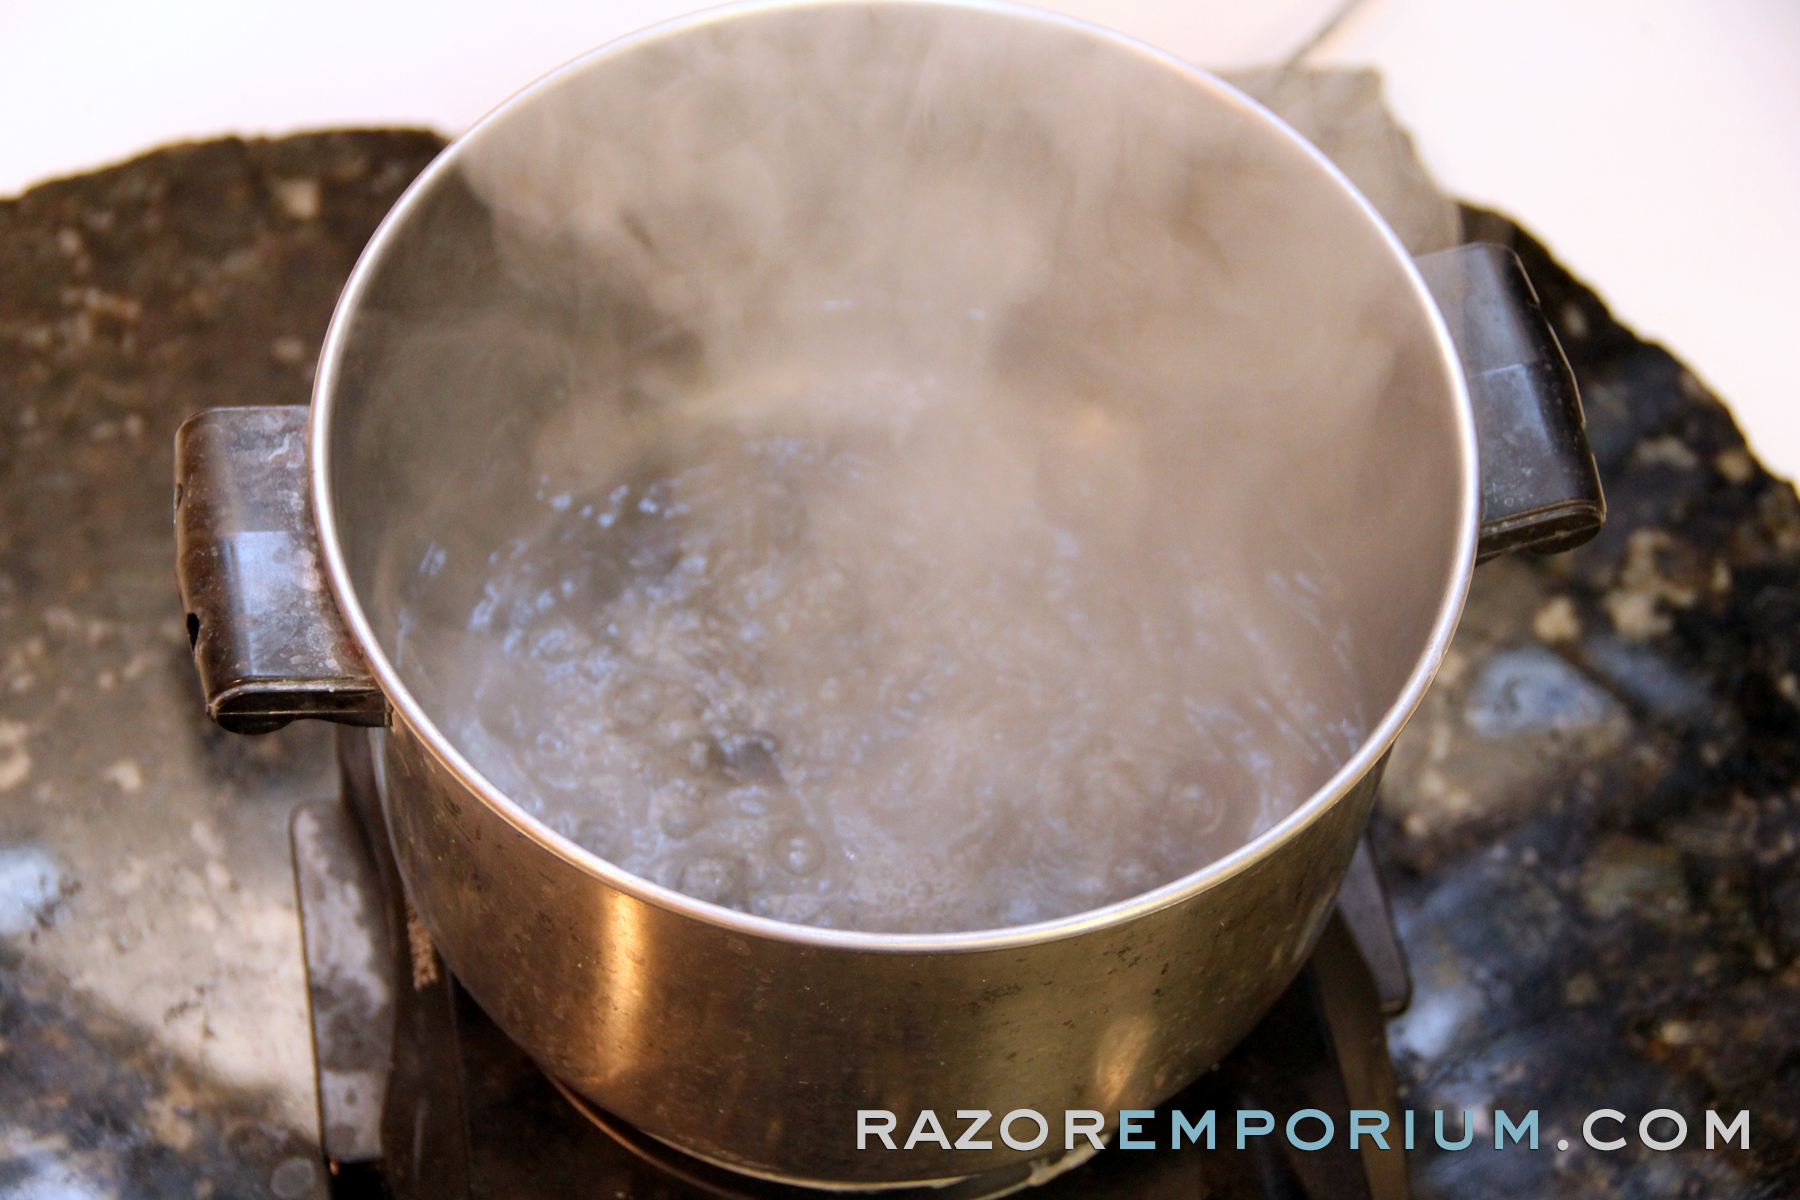 safe silver razor patina removal razor emporium. Black Bedroom Furniture Sets. Home Design Ideas